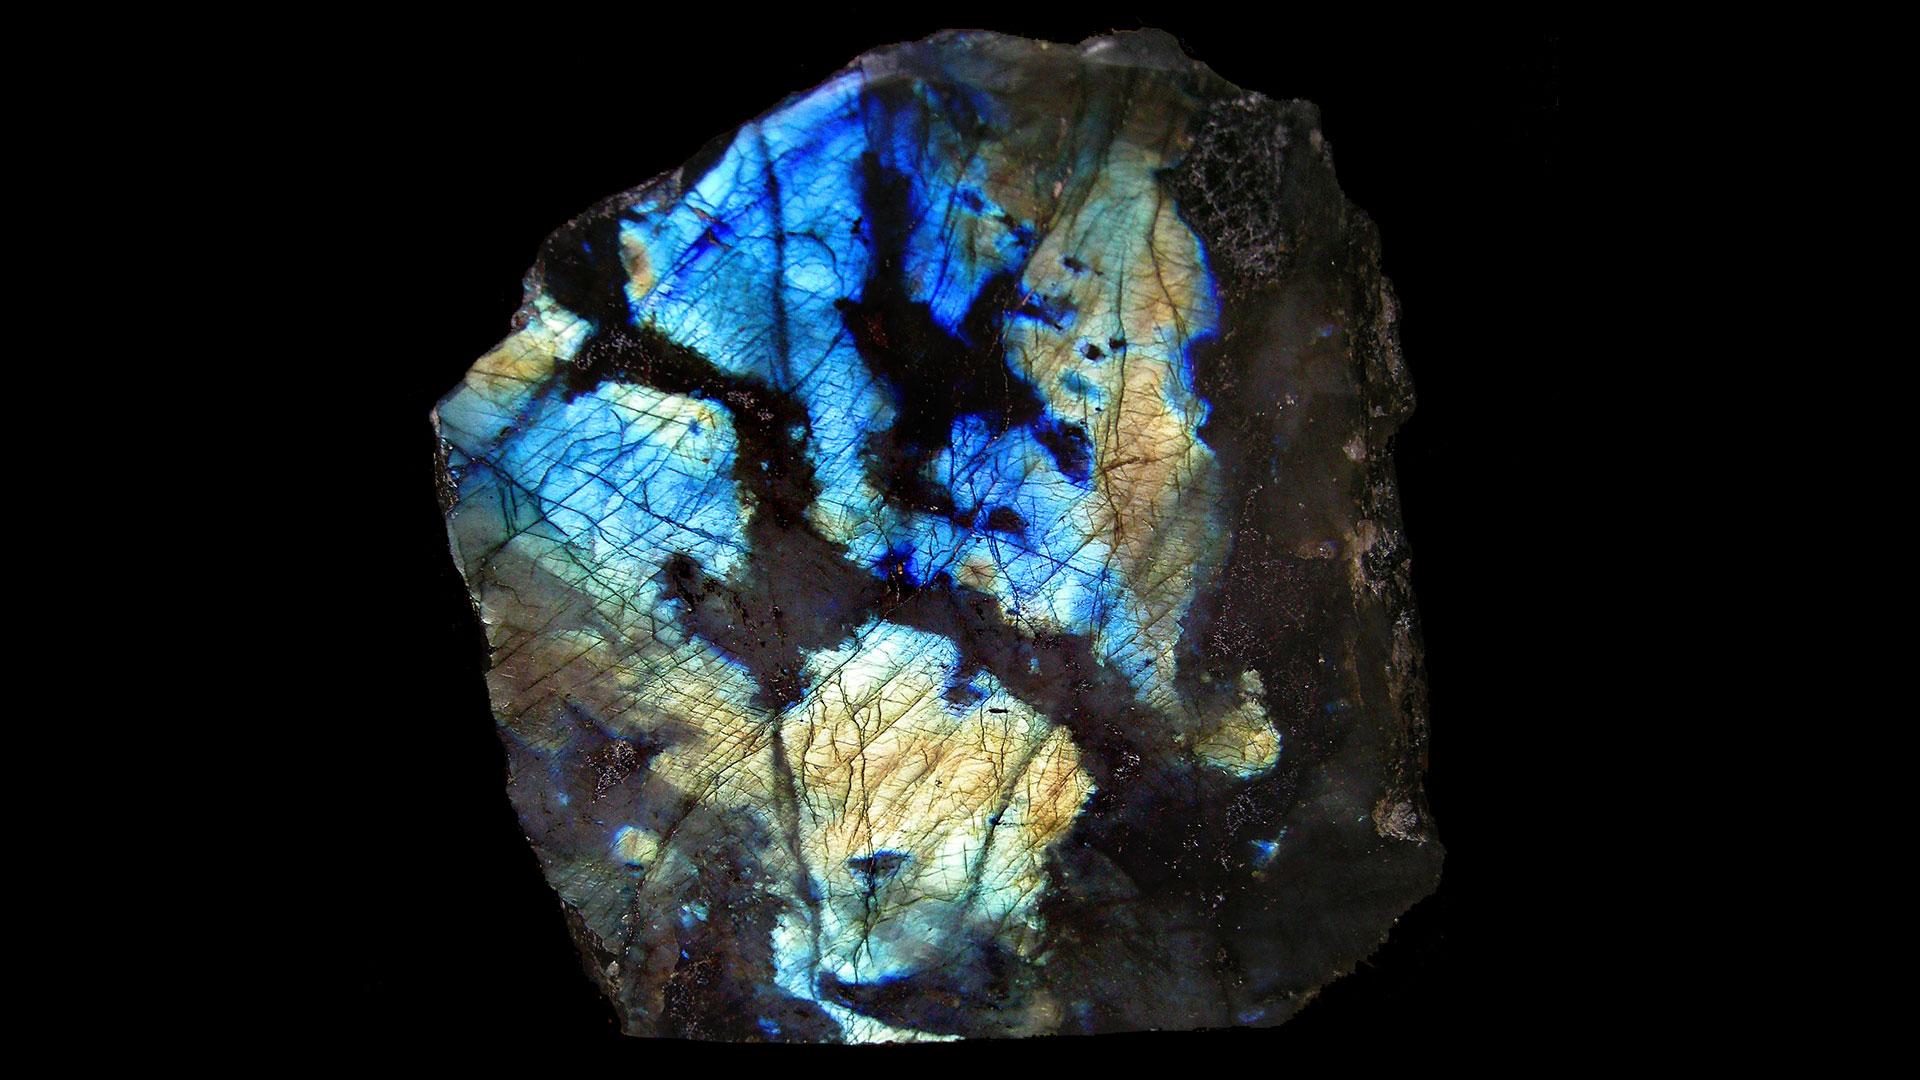 Labradorite Crystal Specimen - Mineral Specimen - Original Photo by Prokofiev